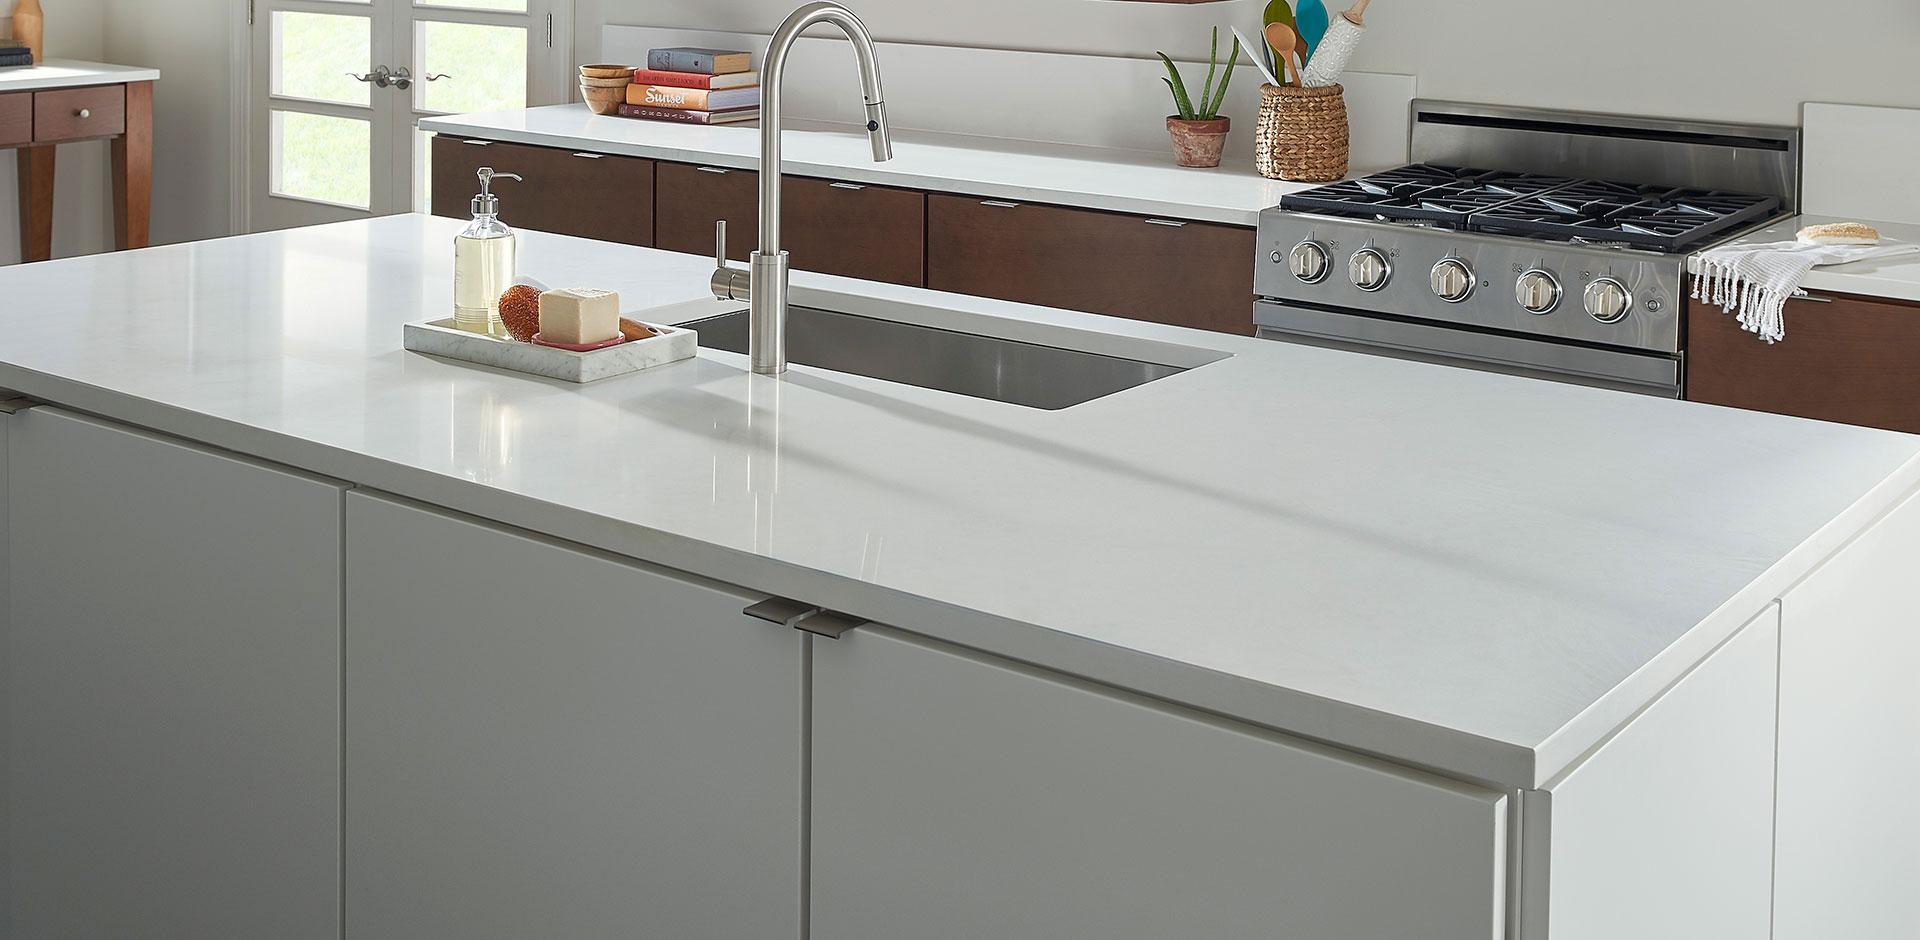 Kitchen Countertop Quartz Arctic White 4 Msi Surfaces